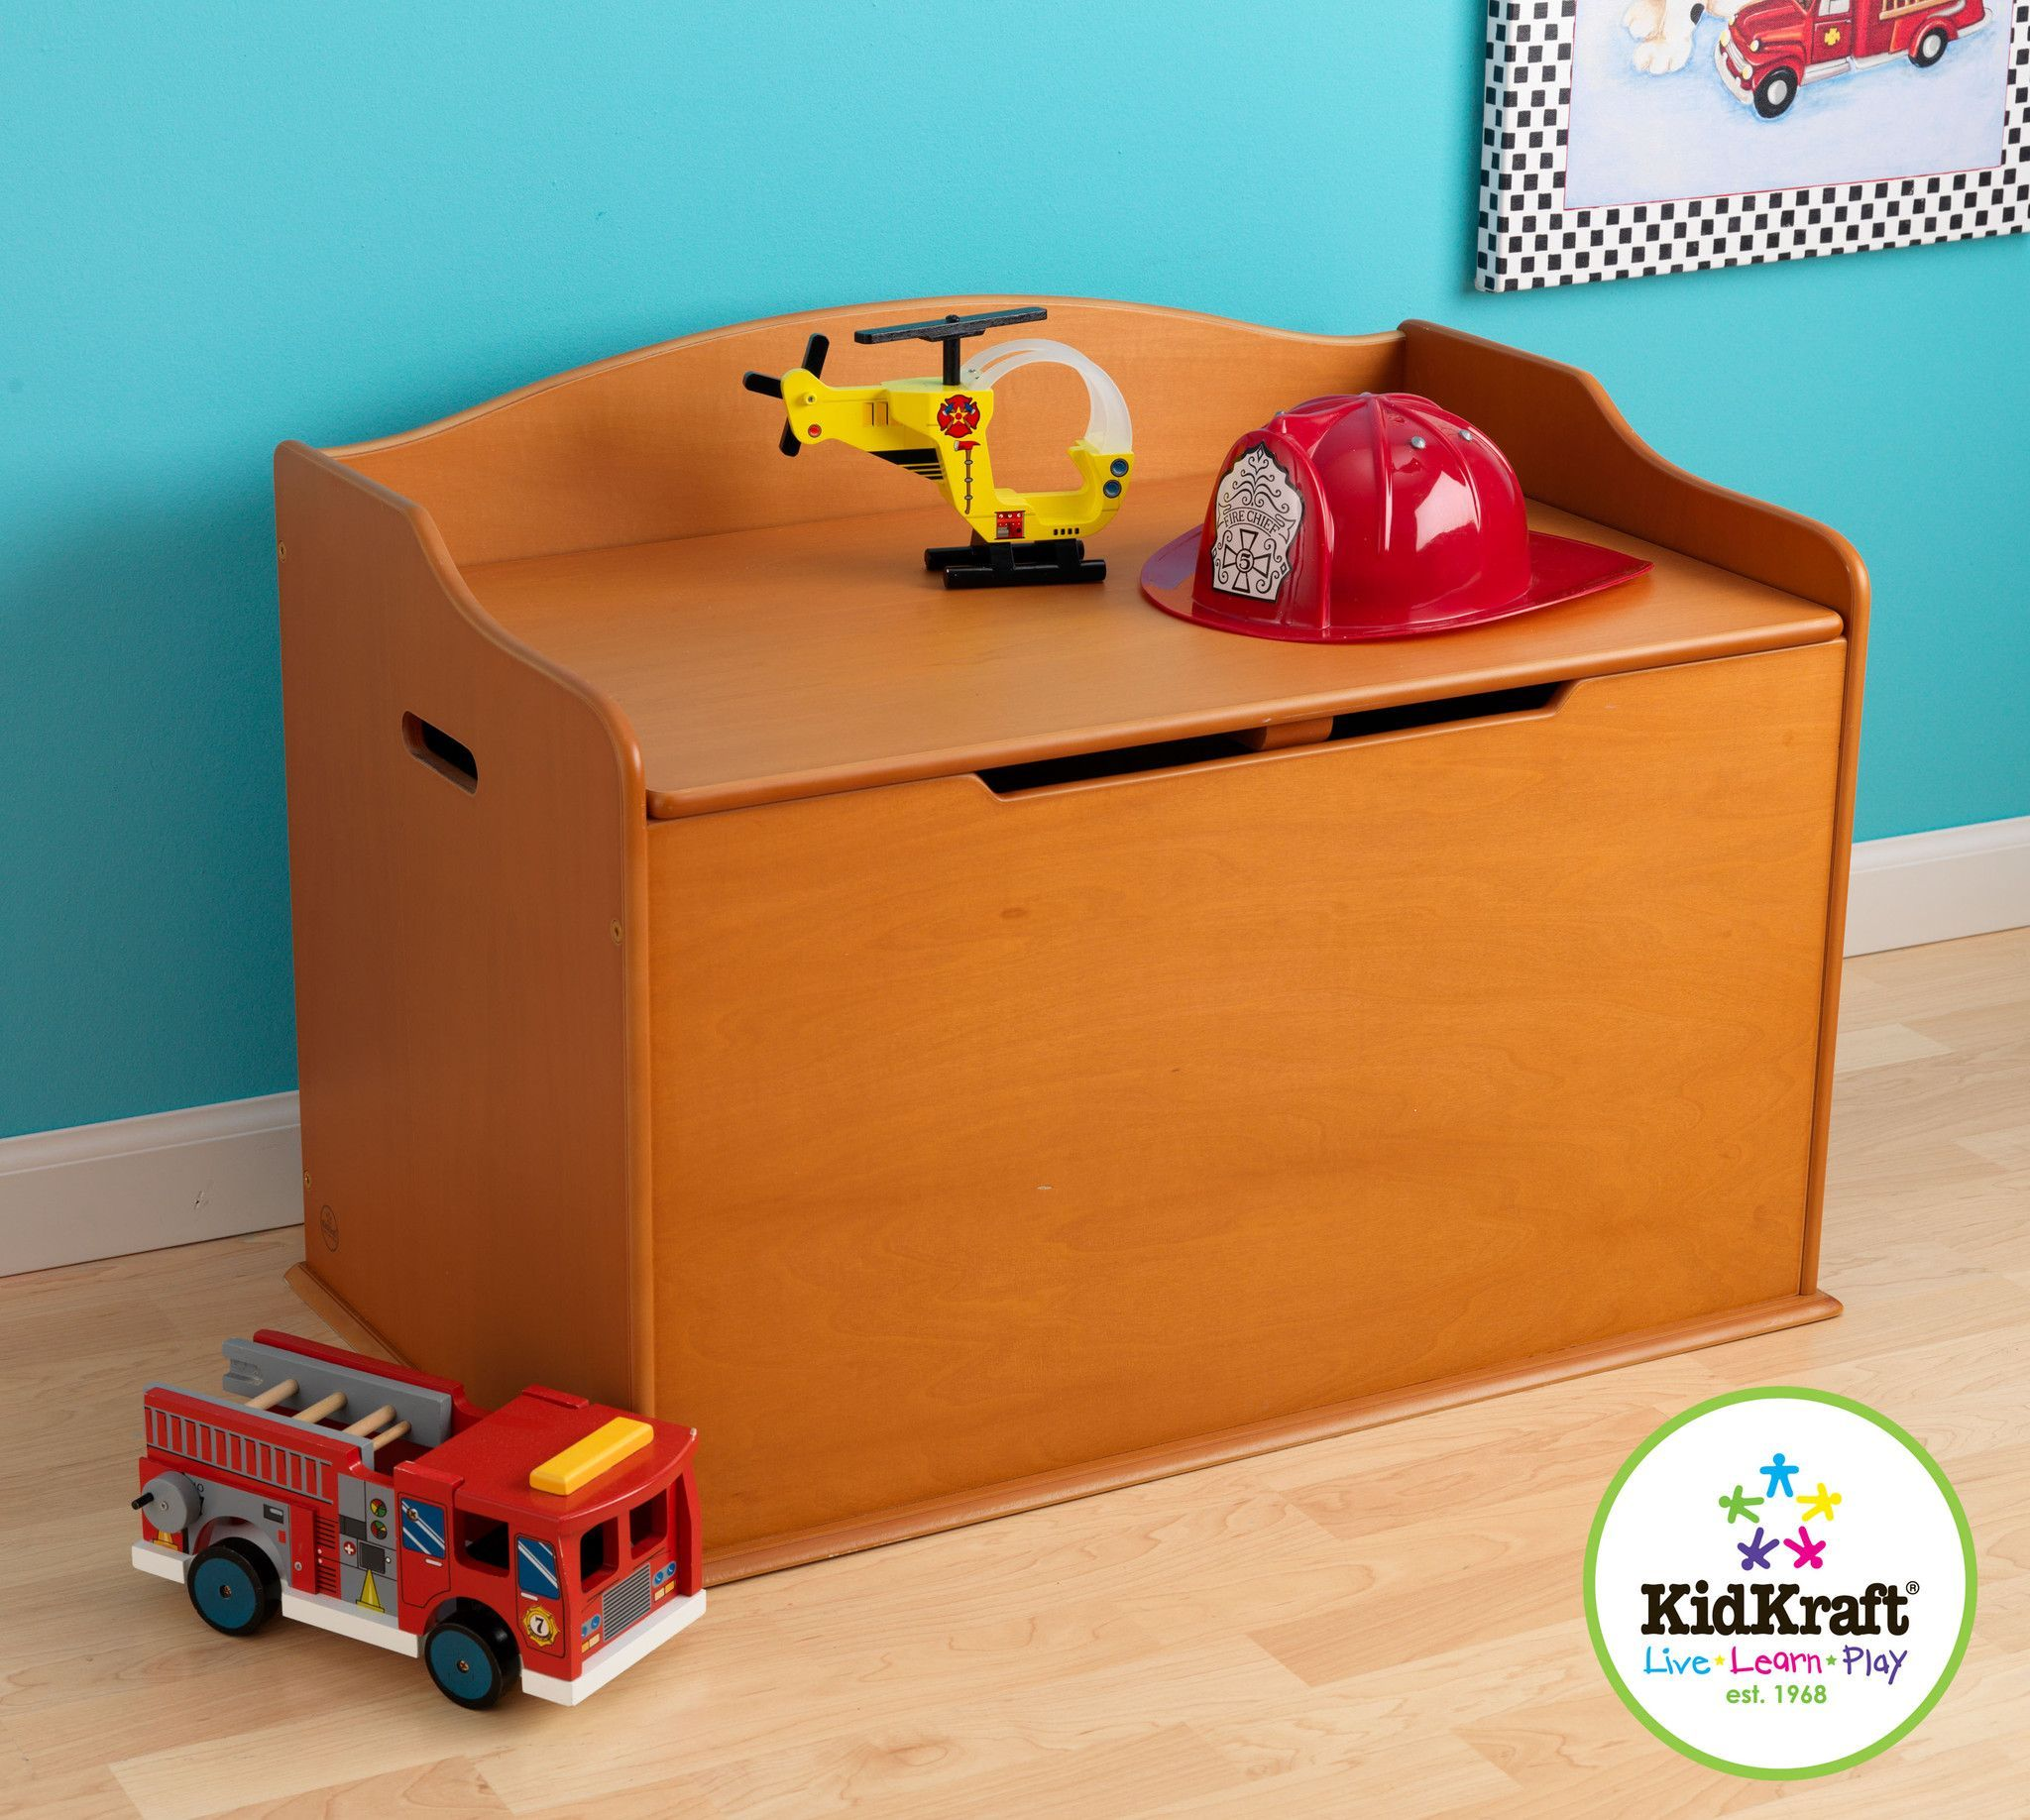 Kidkraft austin toy box natural 14953 - Kidkraft Austin Toy Box Honey 14954